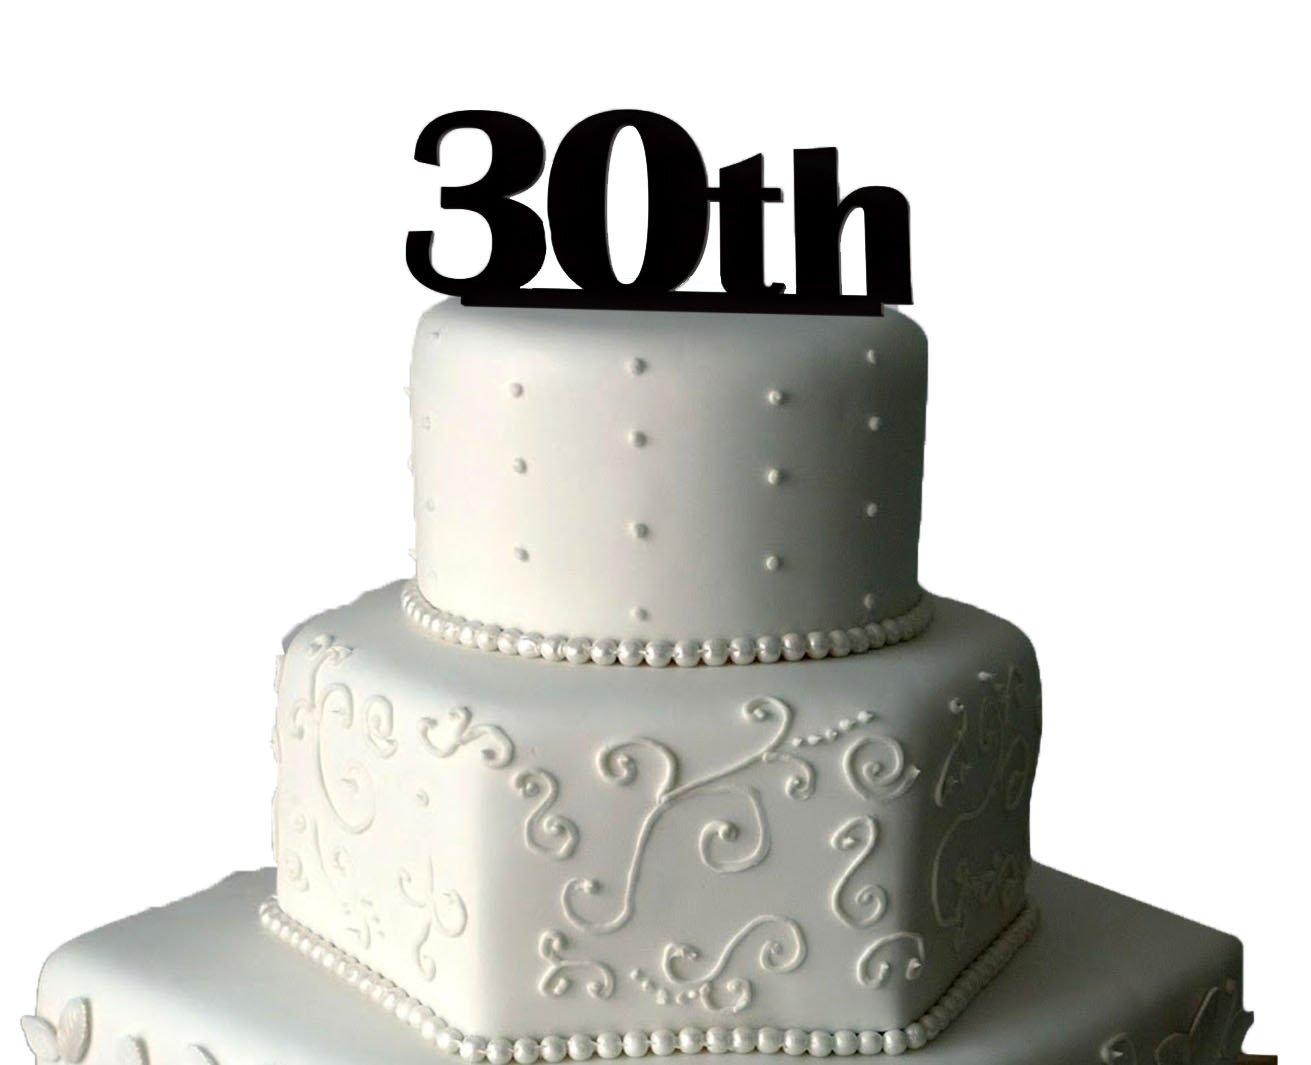 Astounding 30Th Birthday Cake Topper Unique 30Th Birthday Cake Toppers Personalised Birthday Cards Cominlily Jamesorg